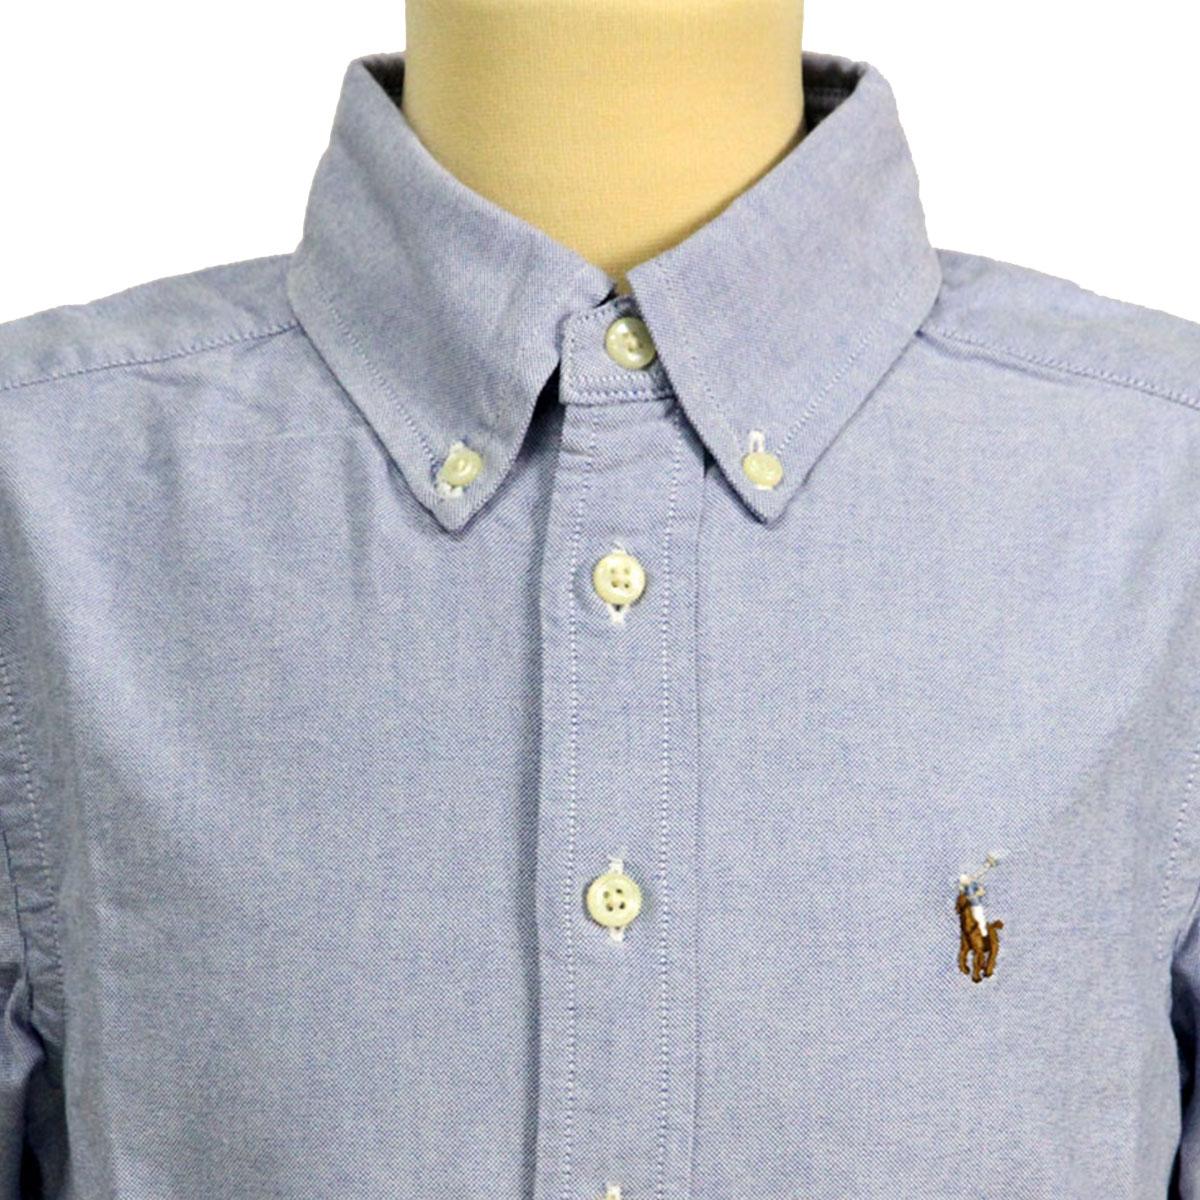 Poloralflorenkids POLO RALPH LAUREN CHILDREN genuine kids clothing boys  short sleeve shirt COTTON OXFORD BLAKE SHIRT 56541166 268eb56b6